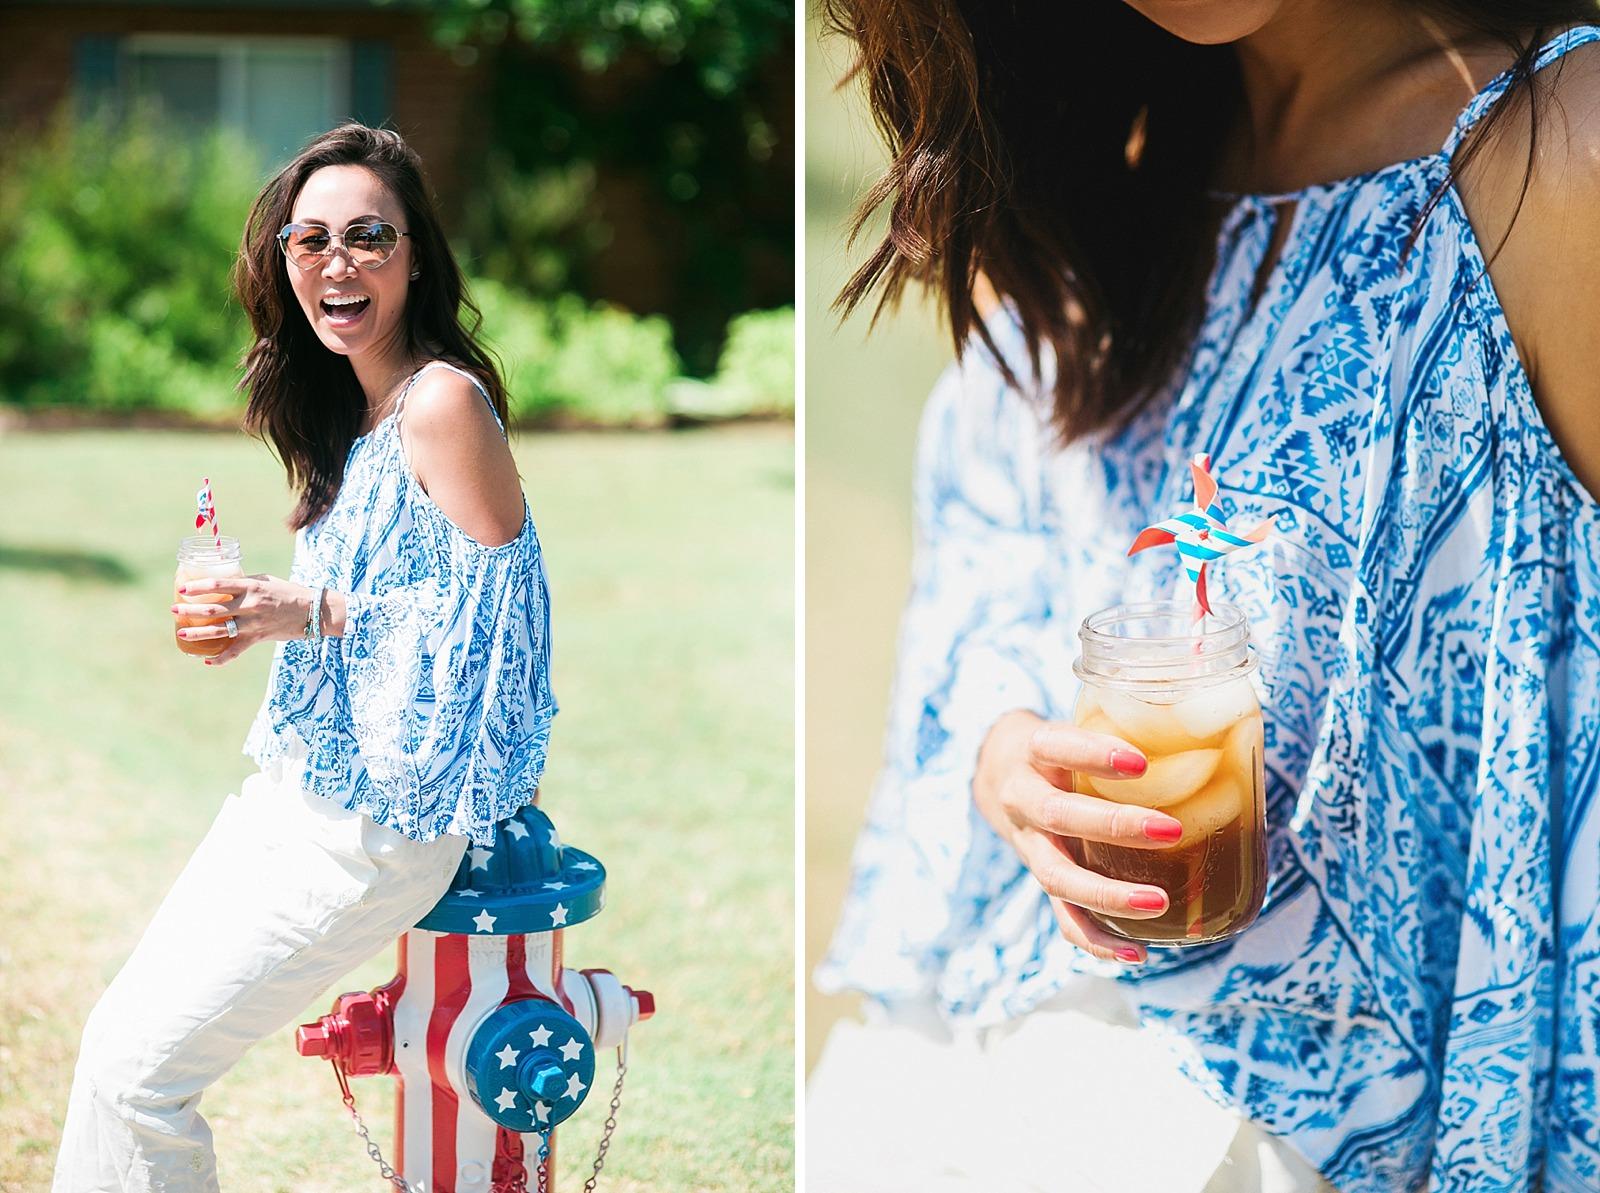 american-flag-fire-hydrant-painted-artistic-lifestyle-blogger-diana-elizabeth-blog-arizona-fashion-pool-summer-time_0098